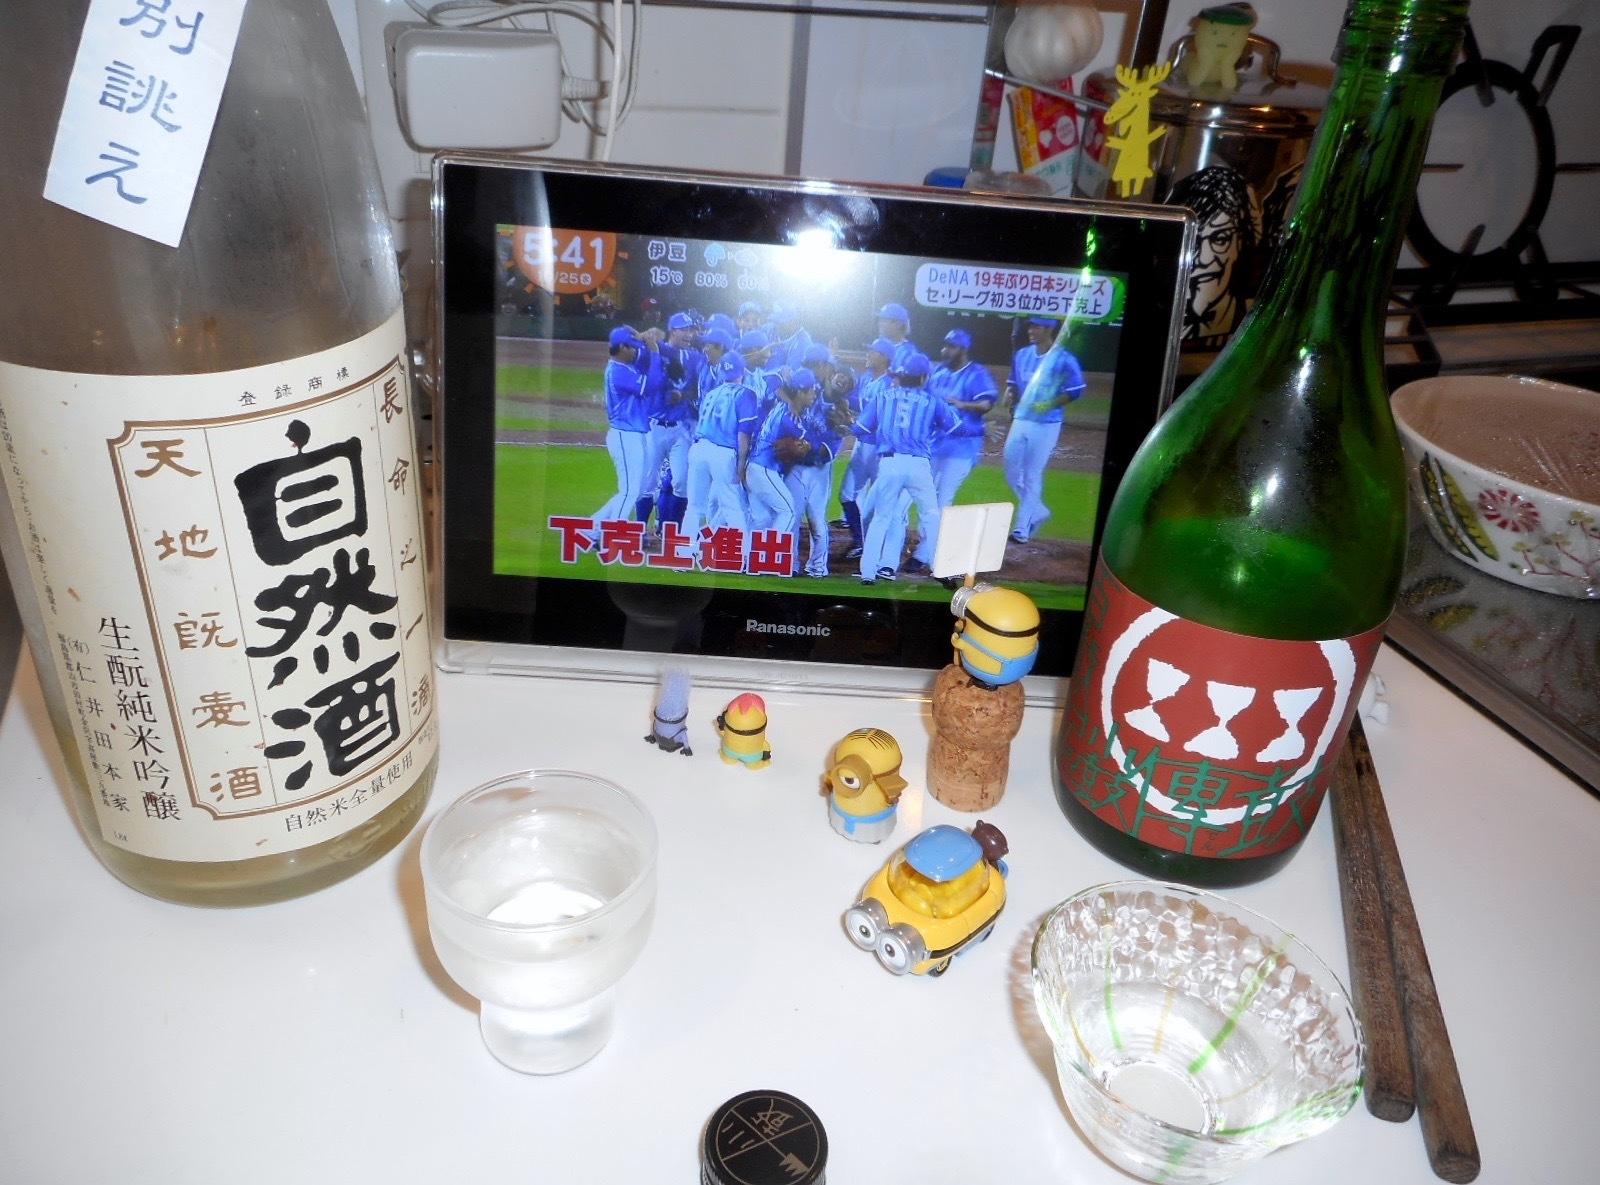 kozutsumi_koden28by6.jpg